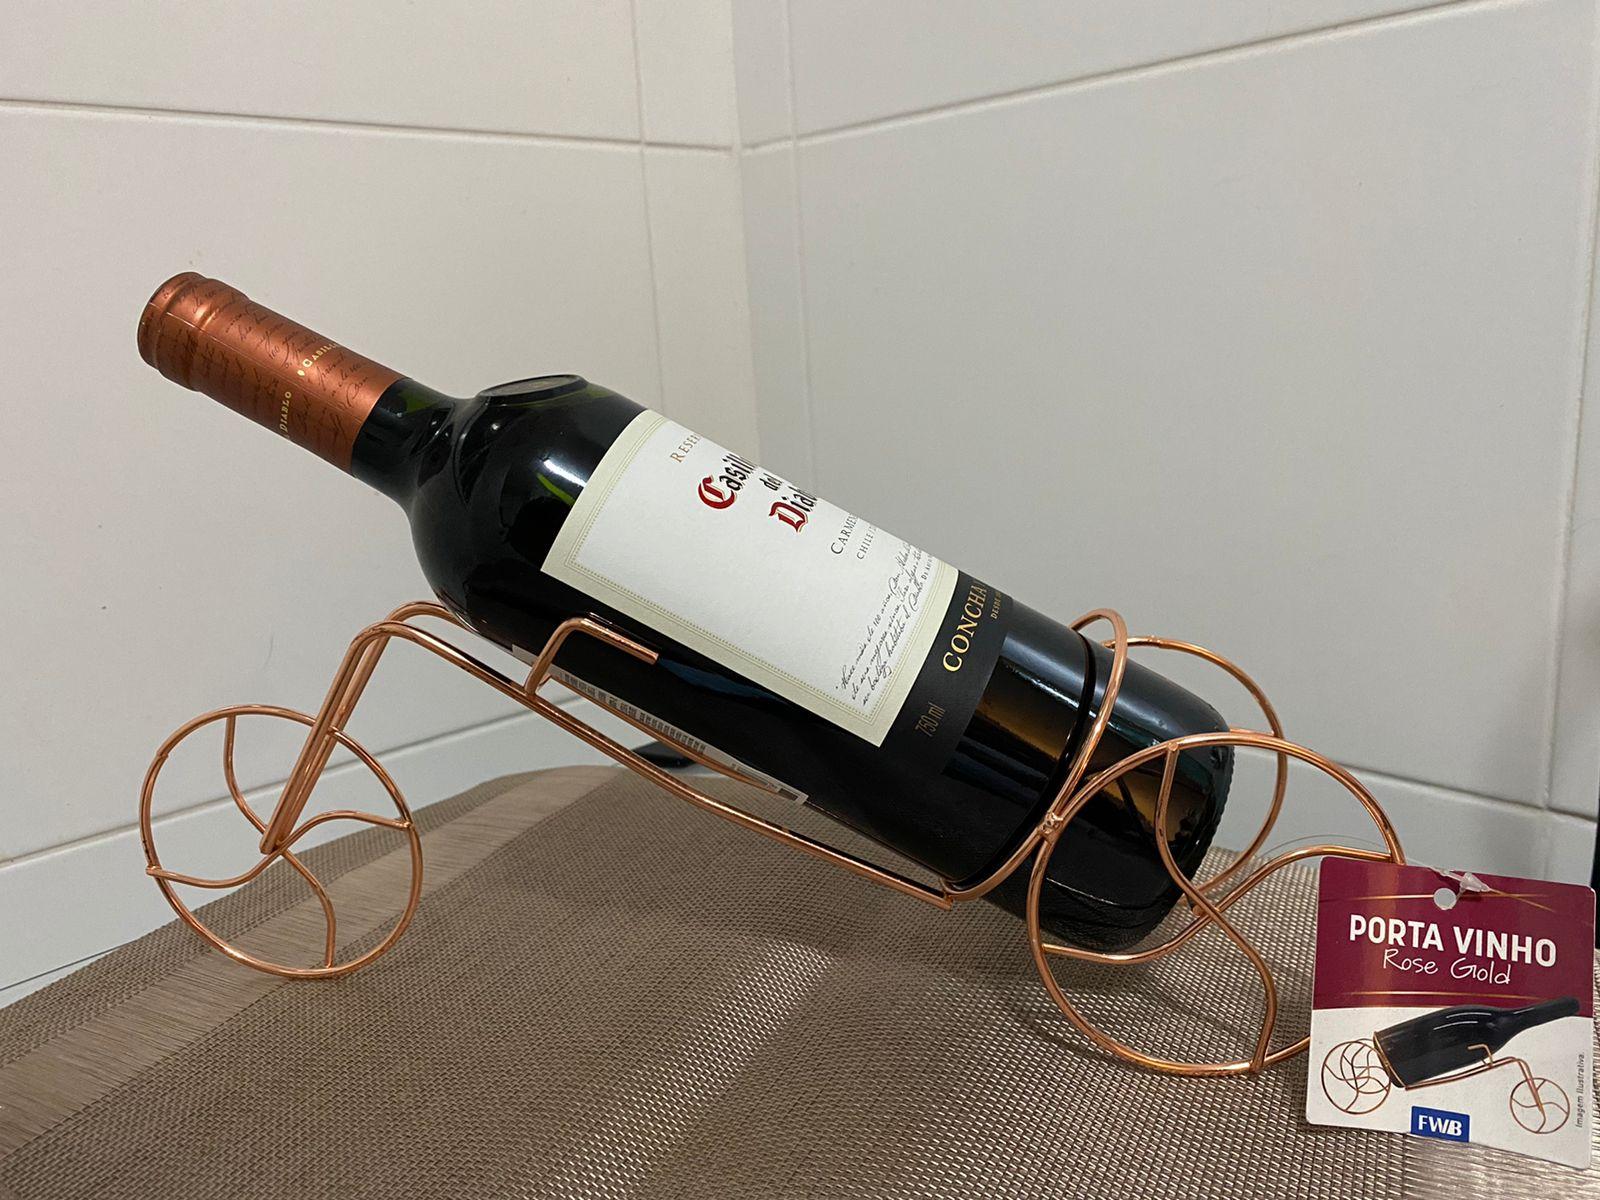 Porta Garrafa de Vinho Aramado Acobreado Rose Gold Formato Bicicleta